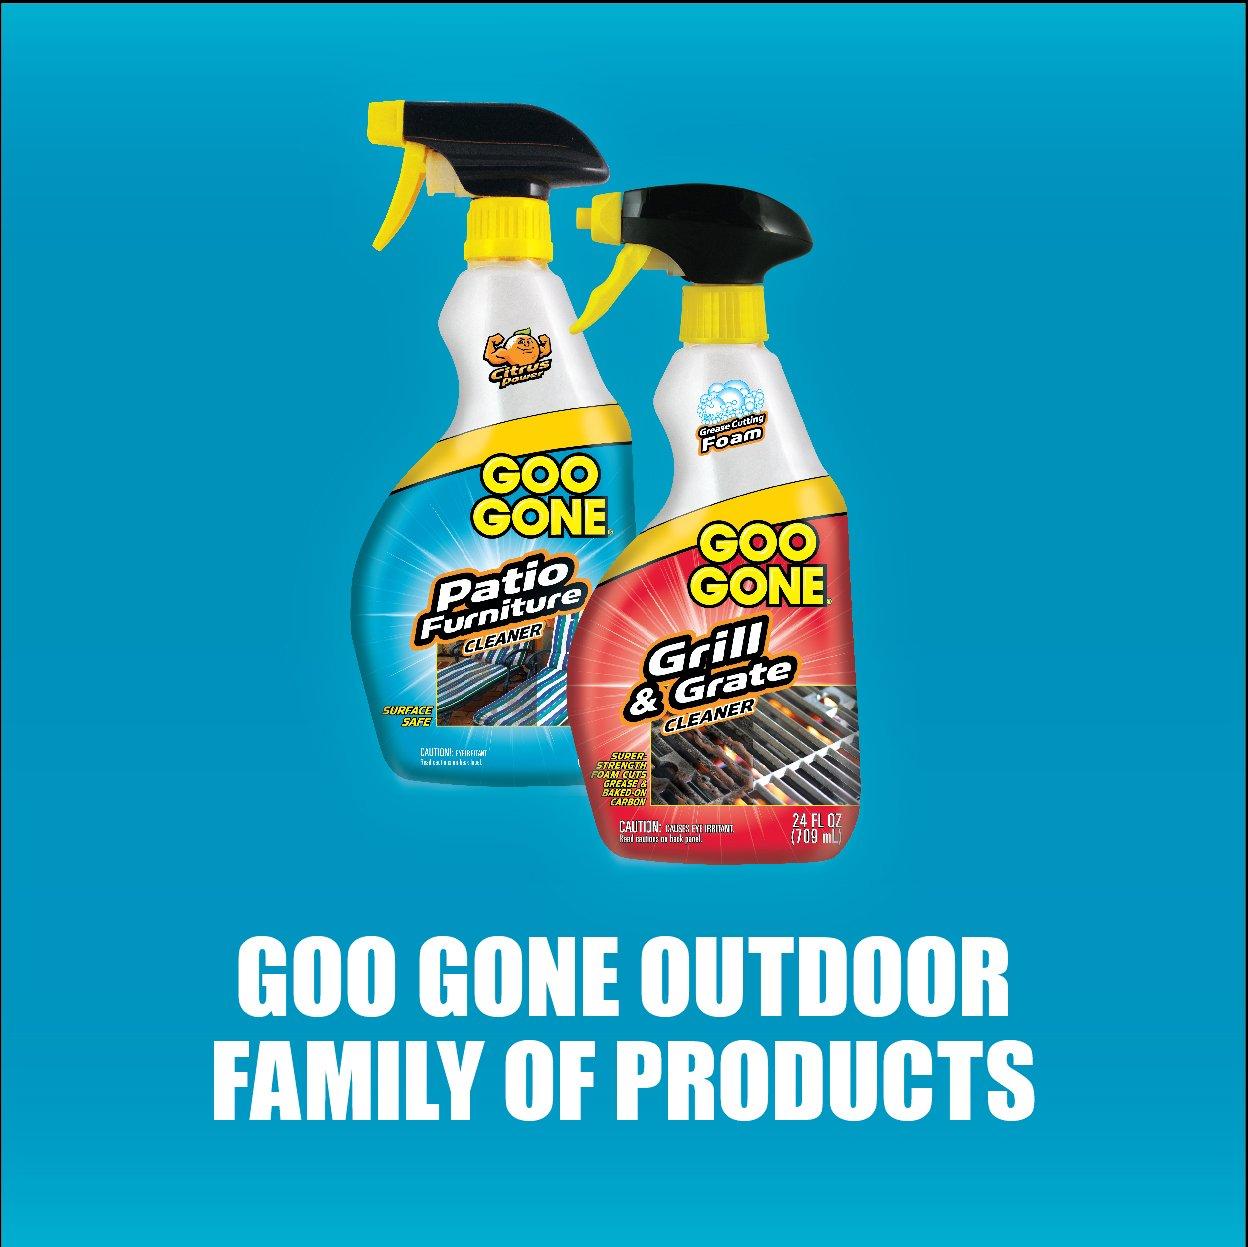 Goo Gone Patio Furniture Cleaner, 24 Fl Oz: Amazon.co.uk: Kitchen U0026 Home